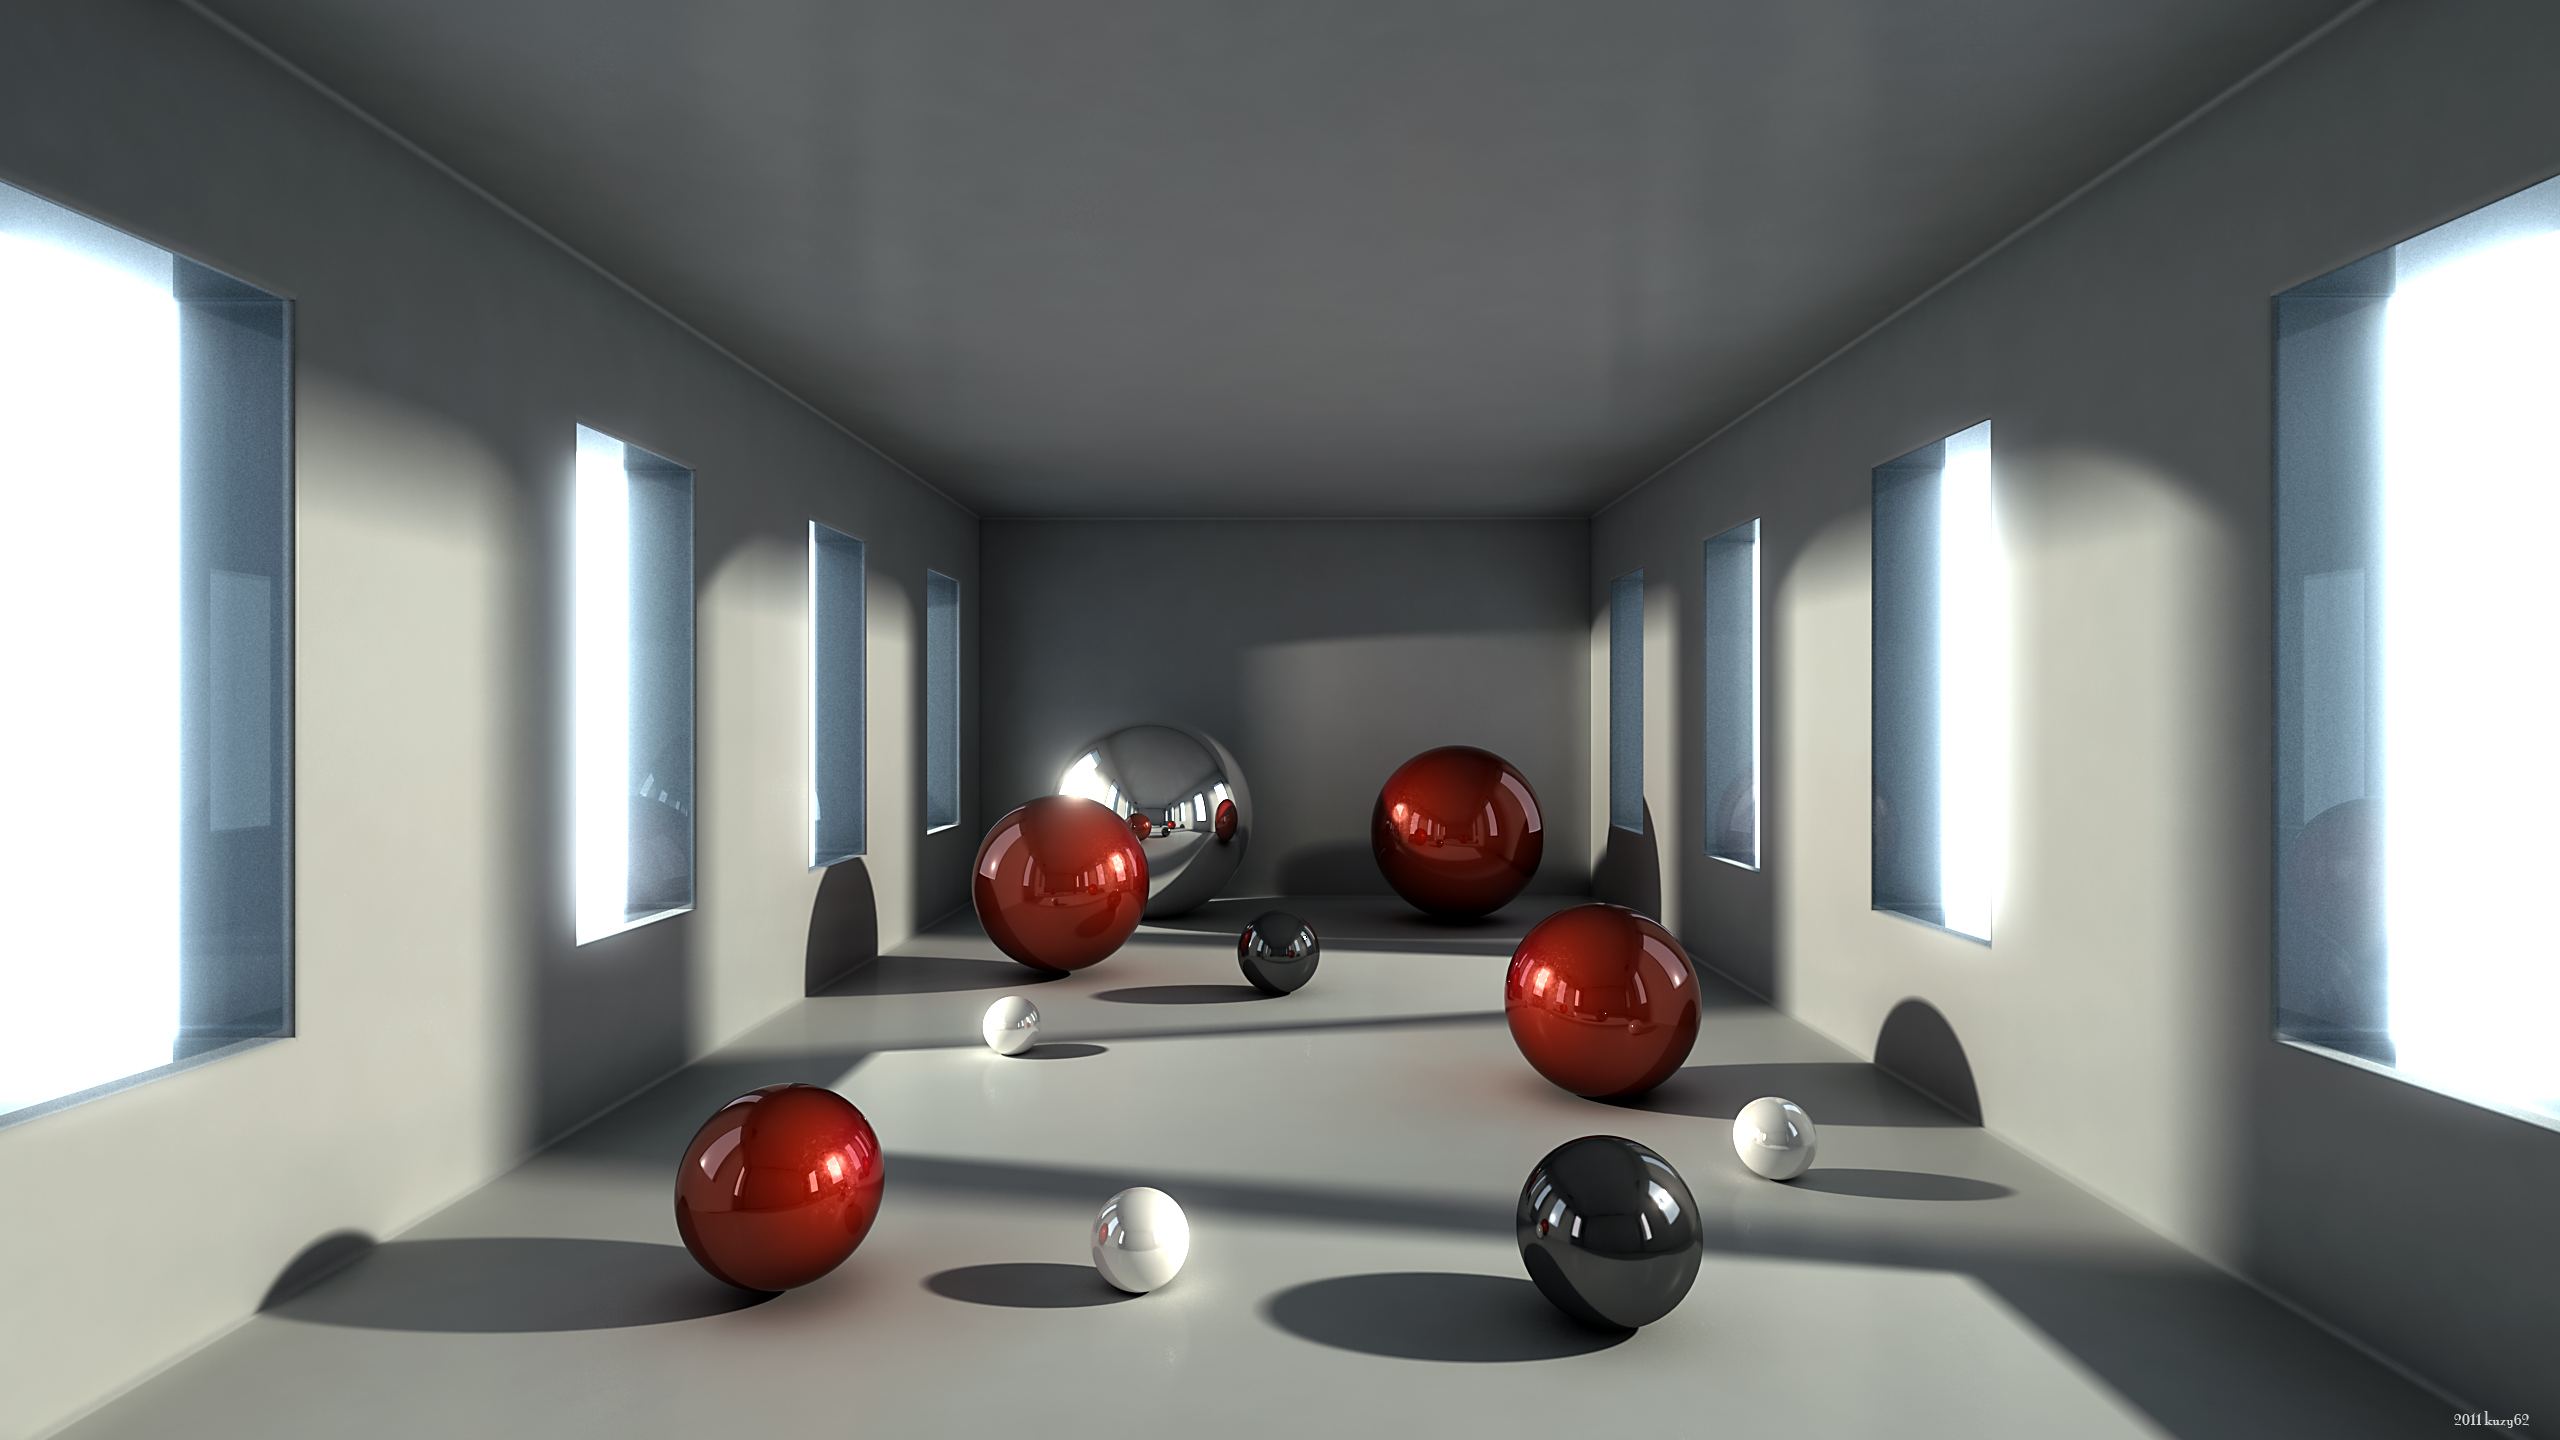 The Corridor by kuzy62